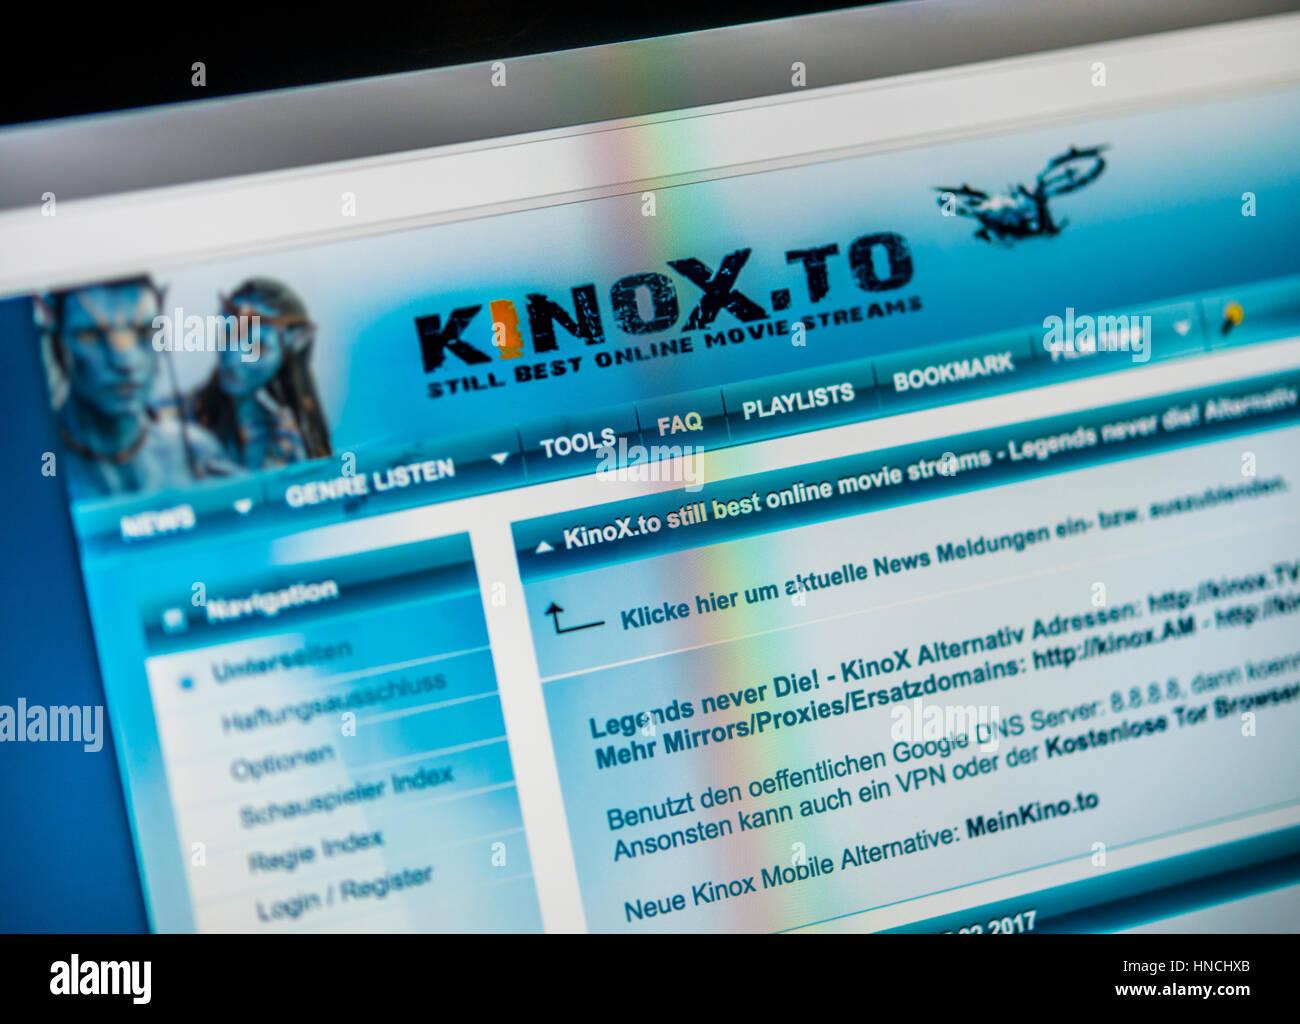 Kinox, Kinox.to, German illegal streaming page, copyright infringement, homepage, logo, internet, Screenshot - Stock Image